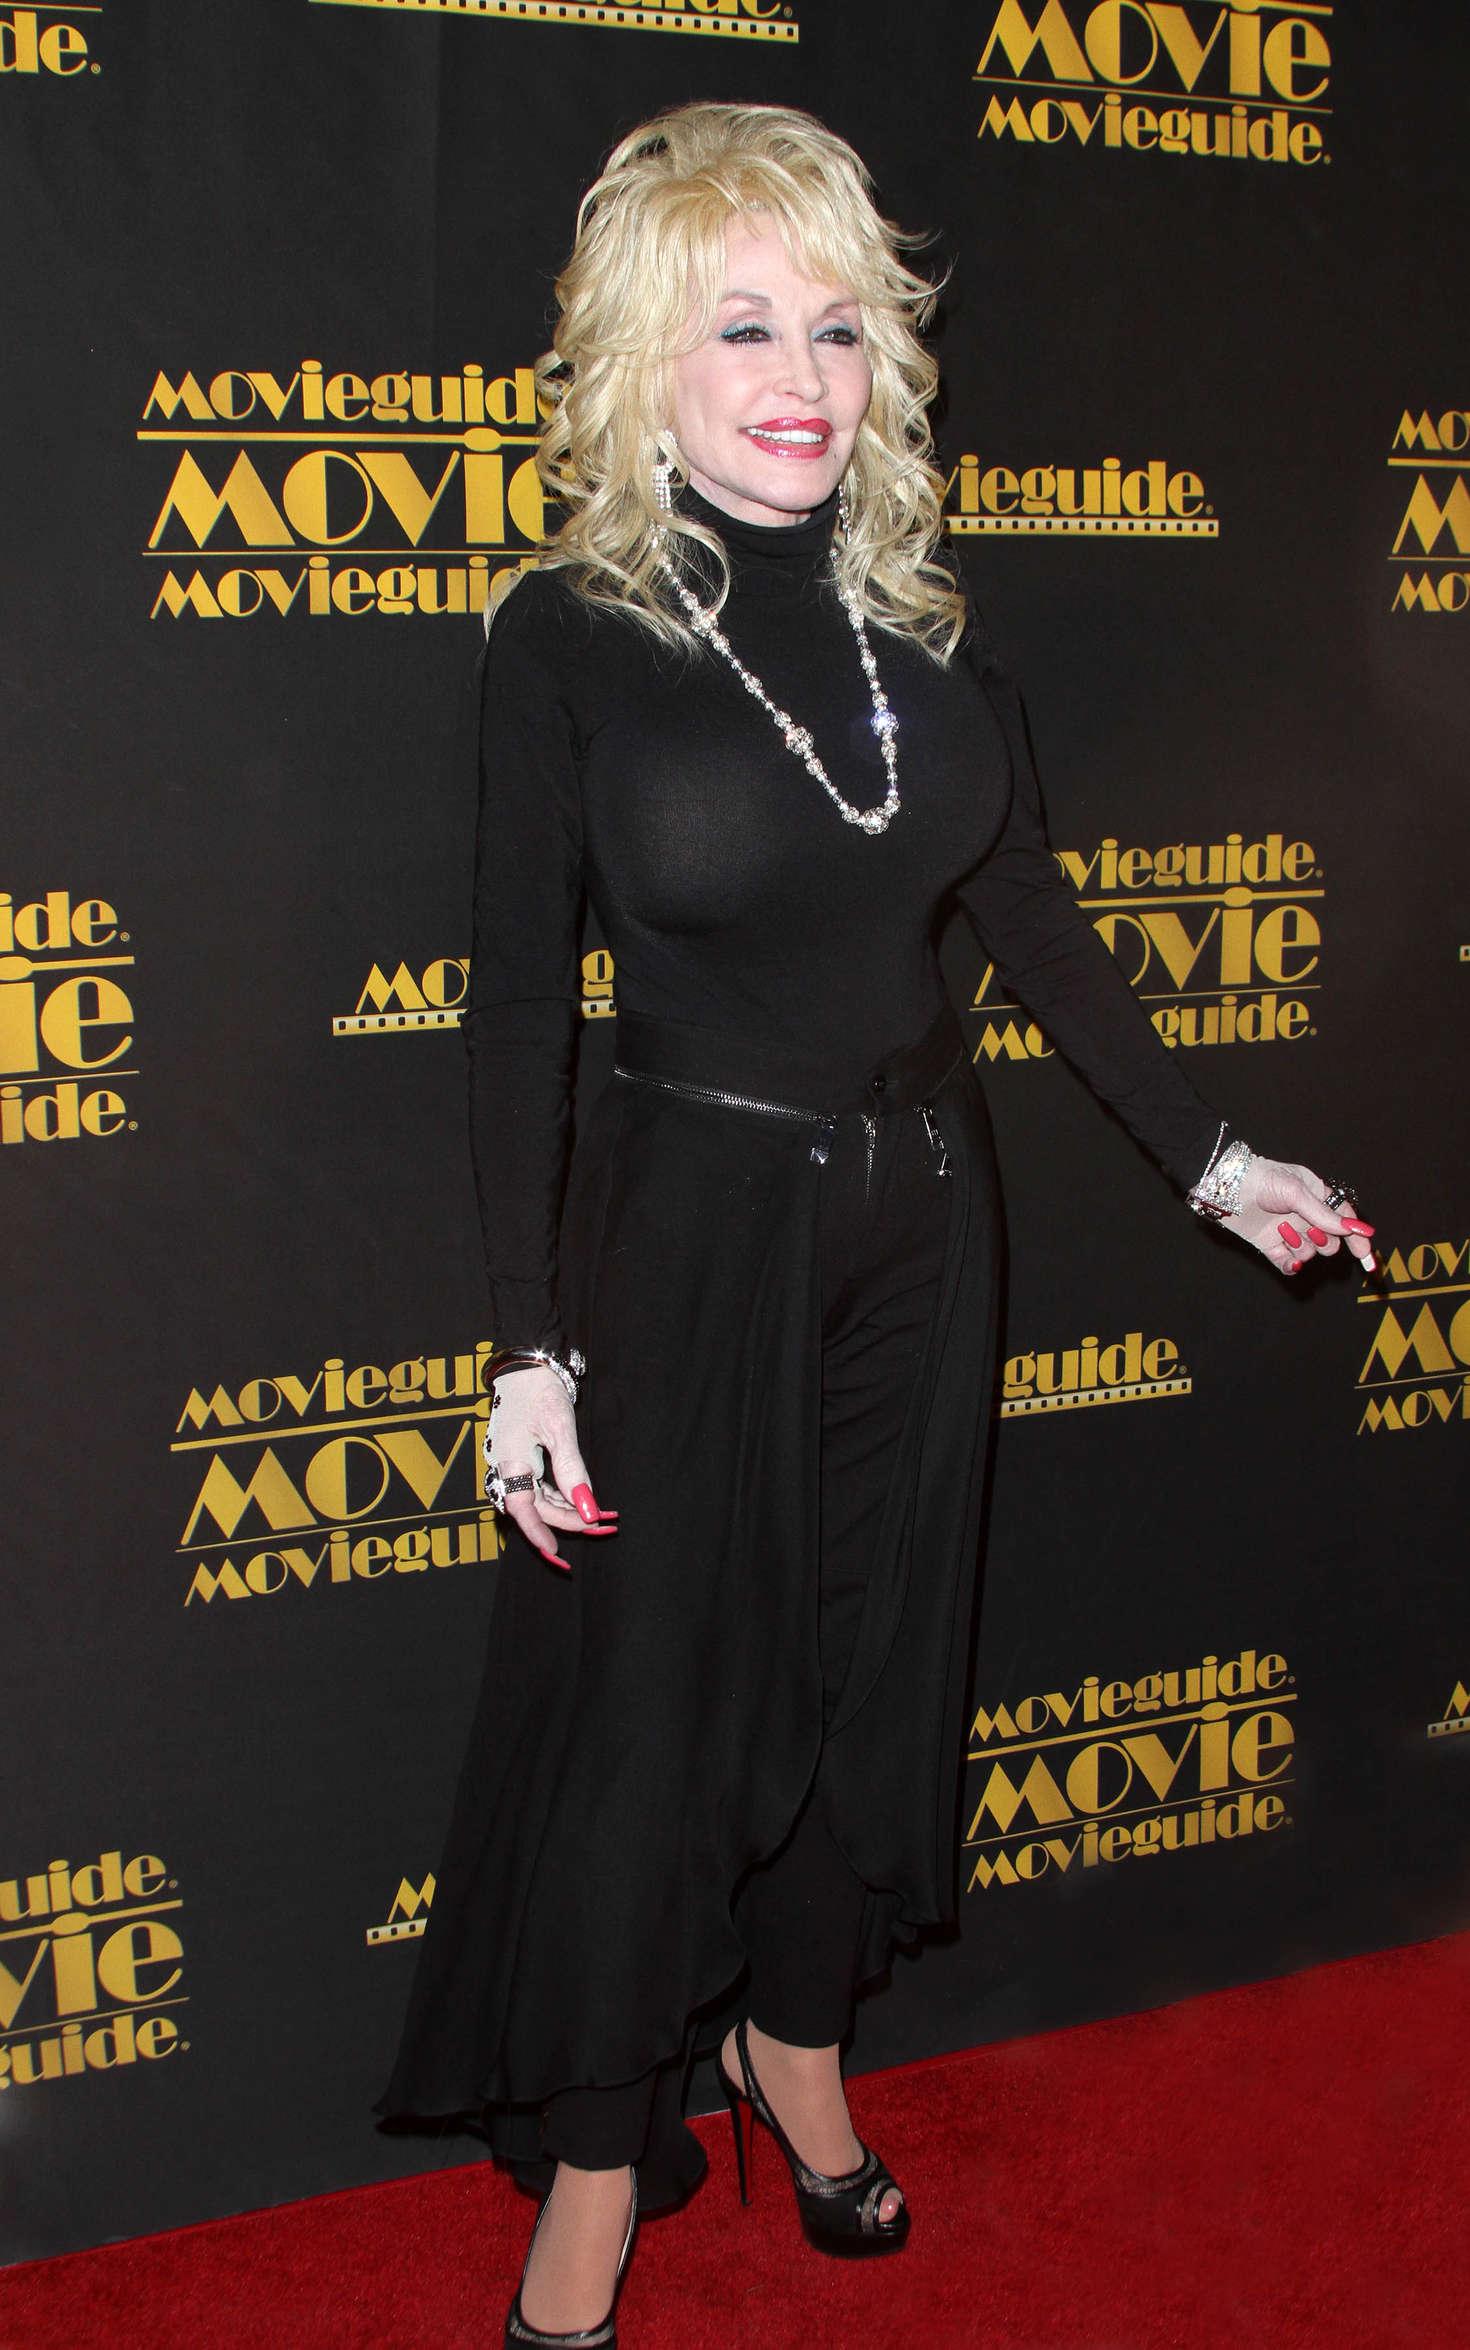 Dolly Parton Annual MovieGuide Awards in Los Angeles